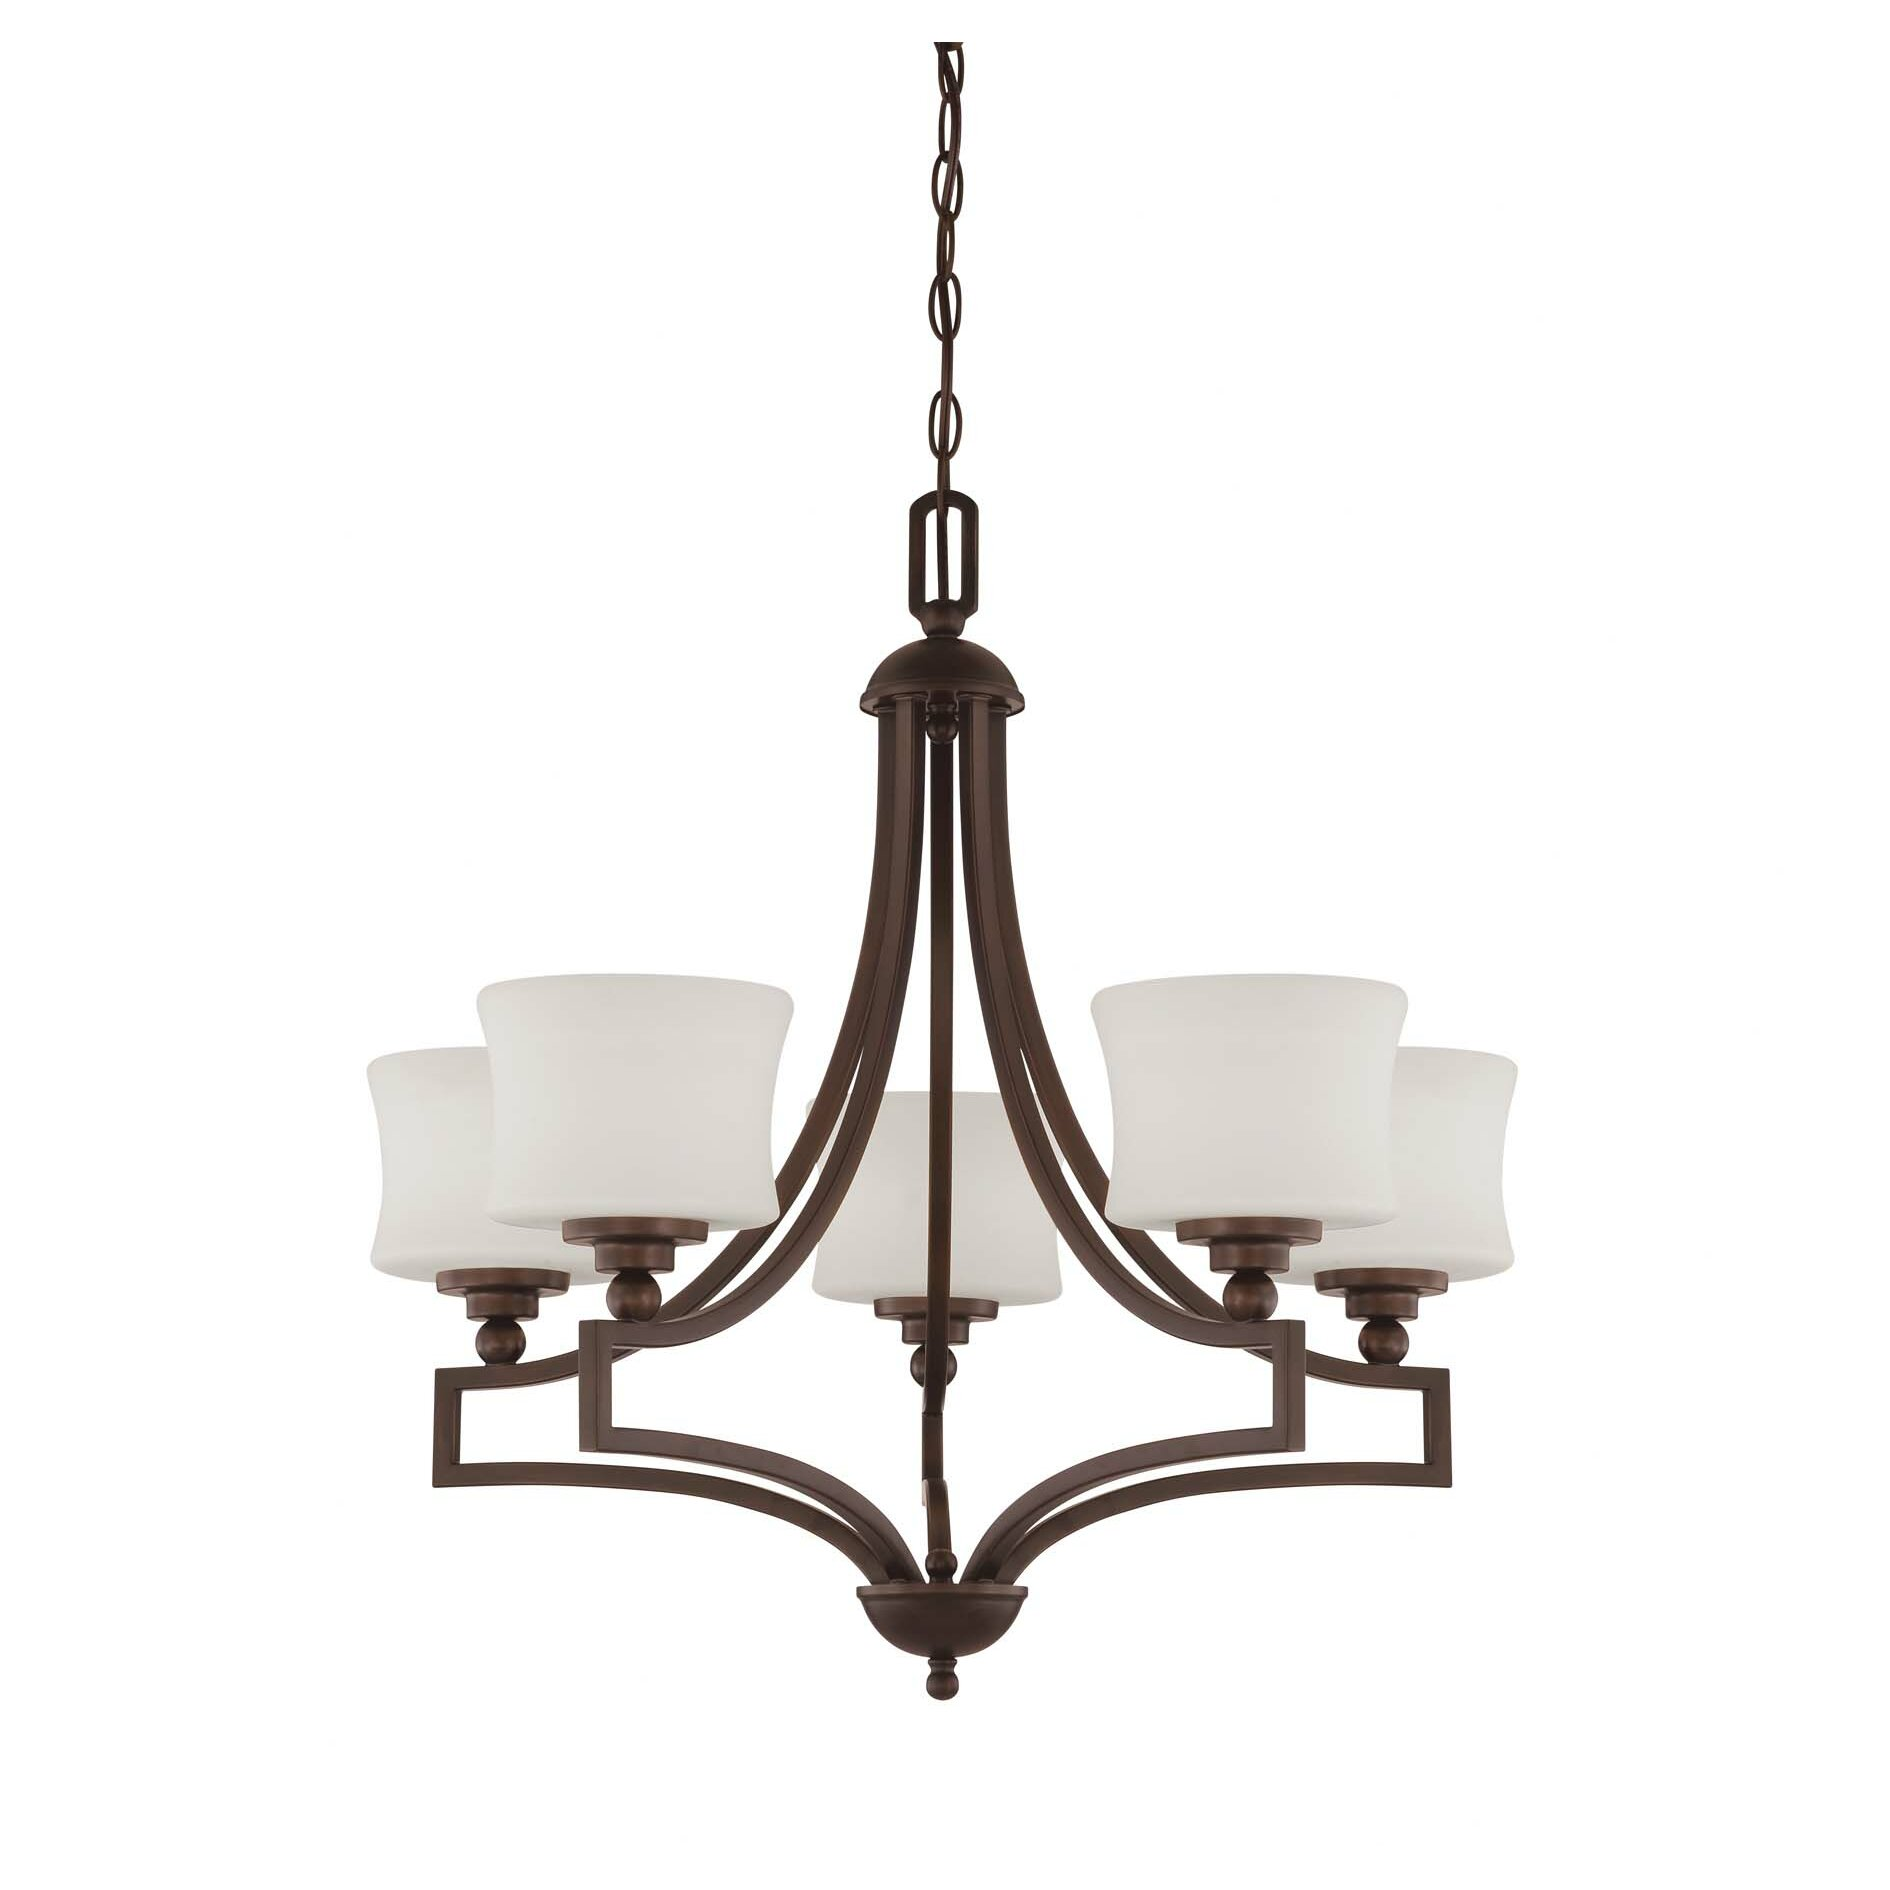 Savoy house terrell 5 light chandelier wayfair for Savoy house